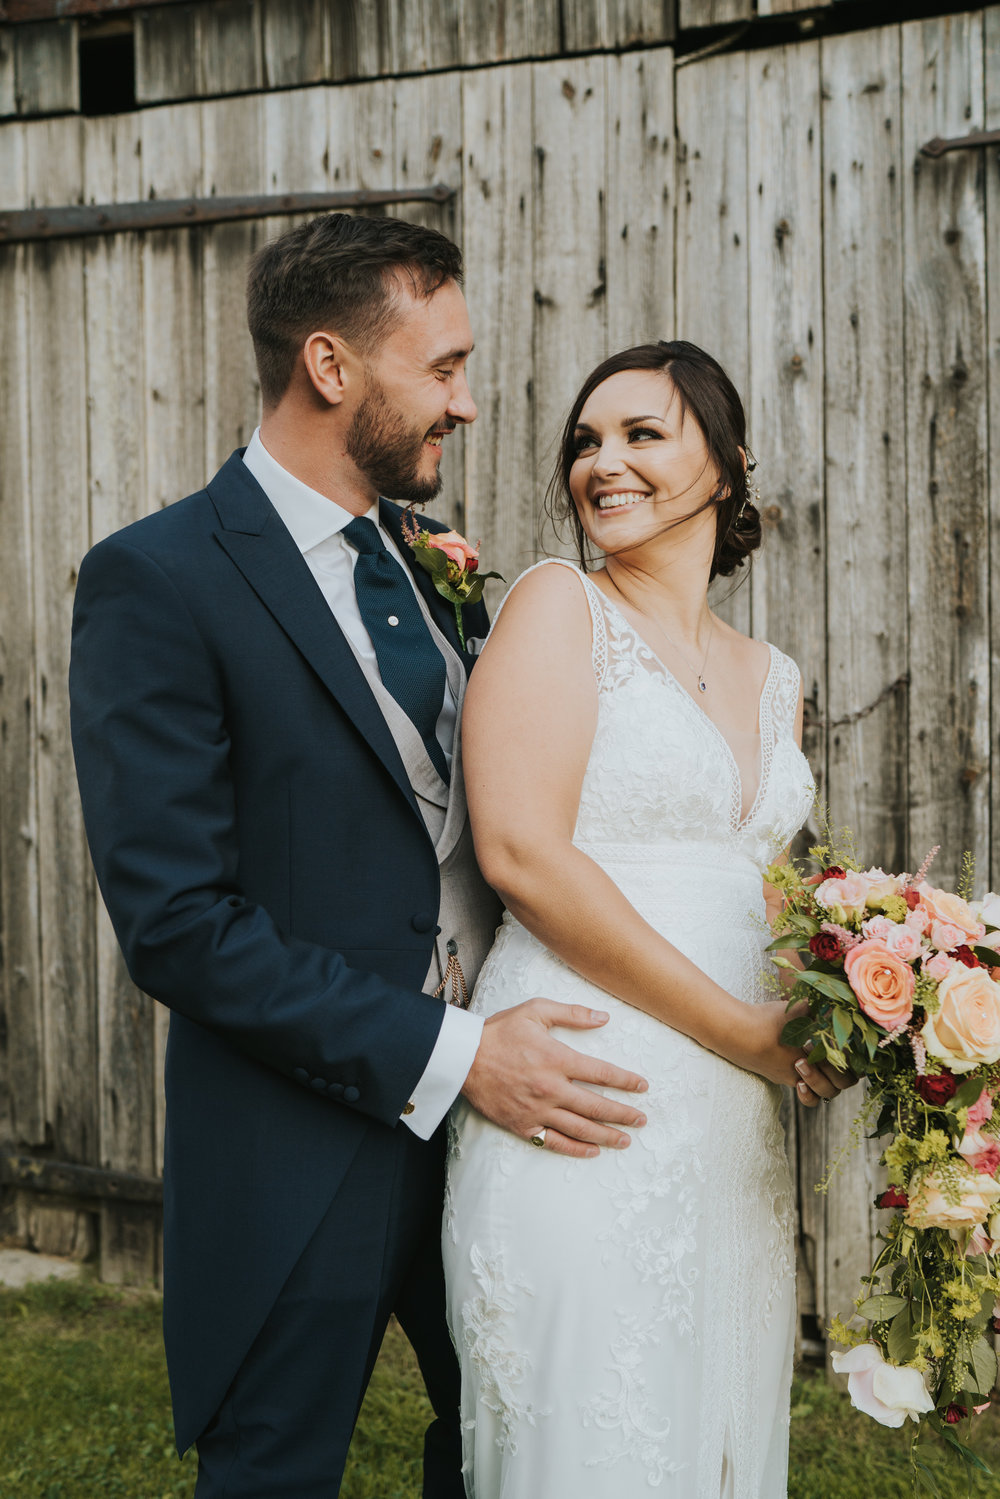 sophie-mark-newland-hall-boho-wedding-grace-elizanbeth-alternative-wedding-photographer-colchester-essex-norfolk-suffolk-devon (141 of 161).jpg